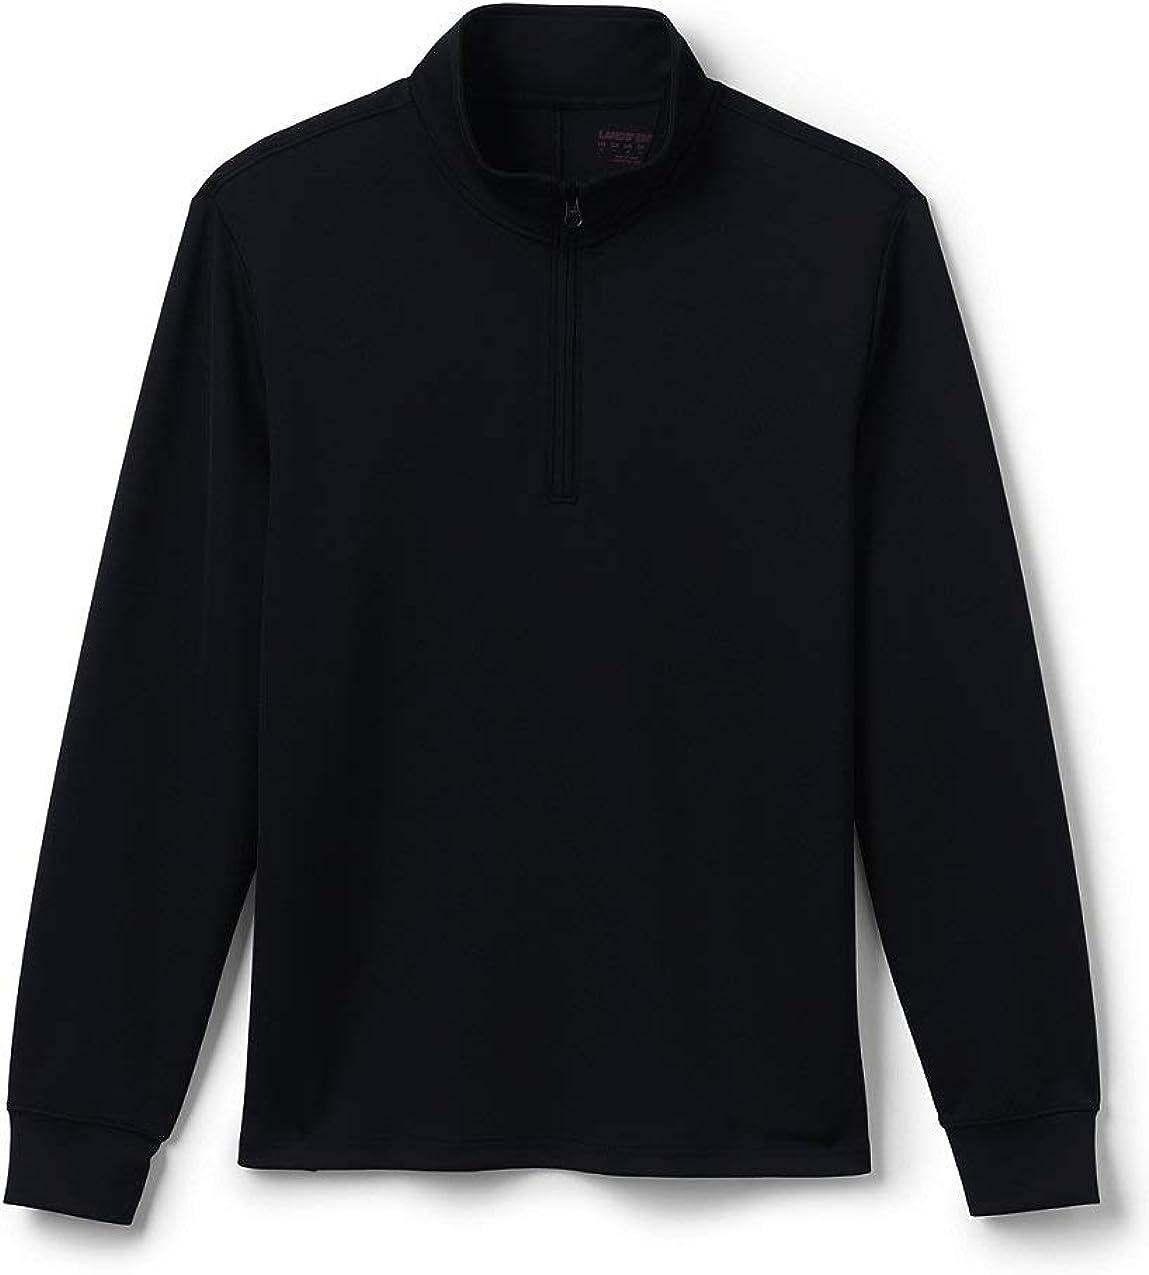 Lands' End School Uniform Men's Quarter Zip Pullover